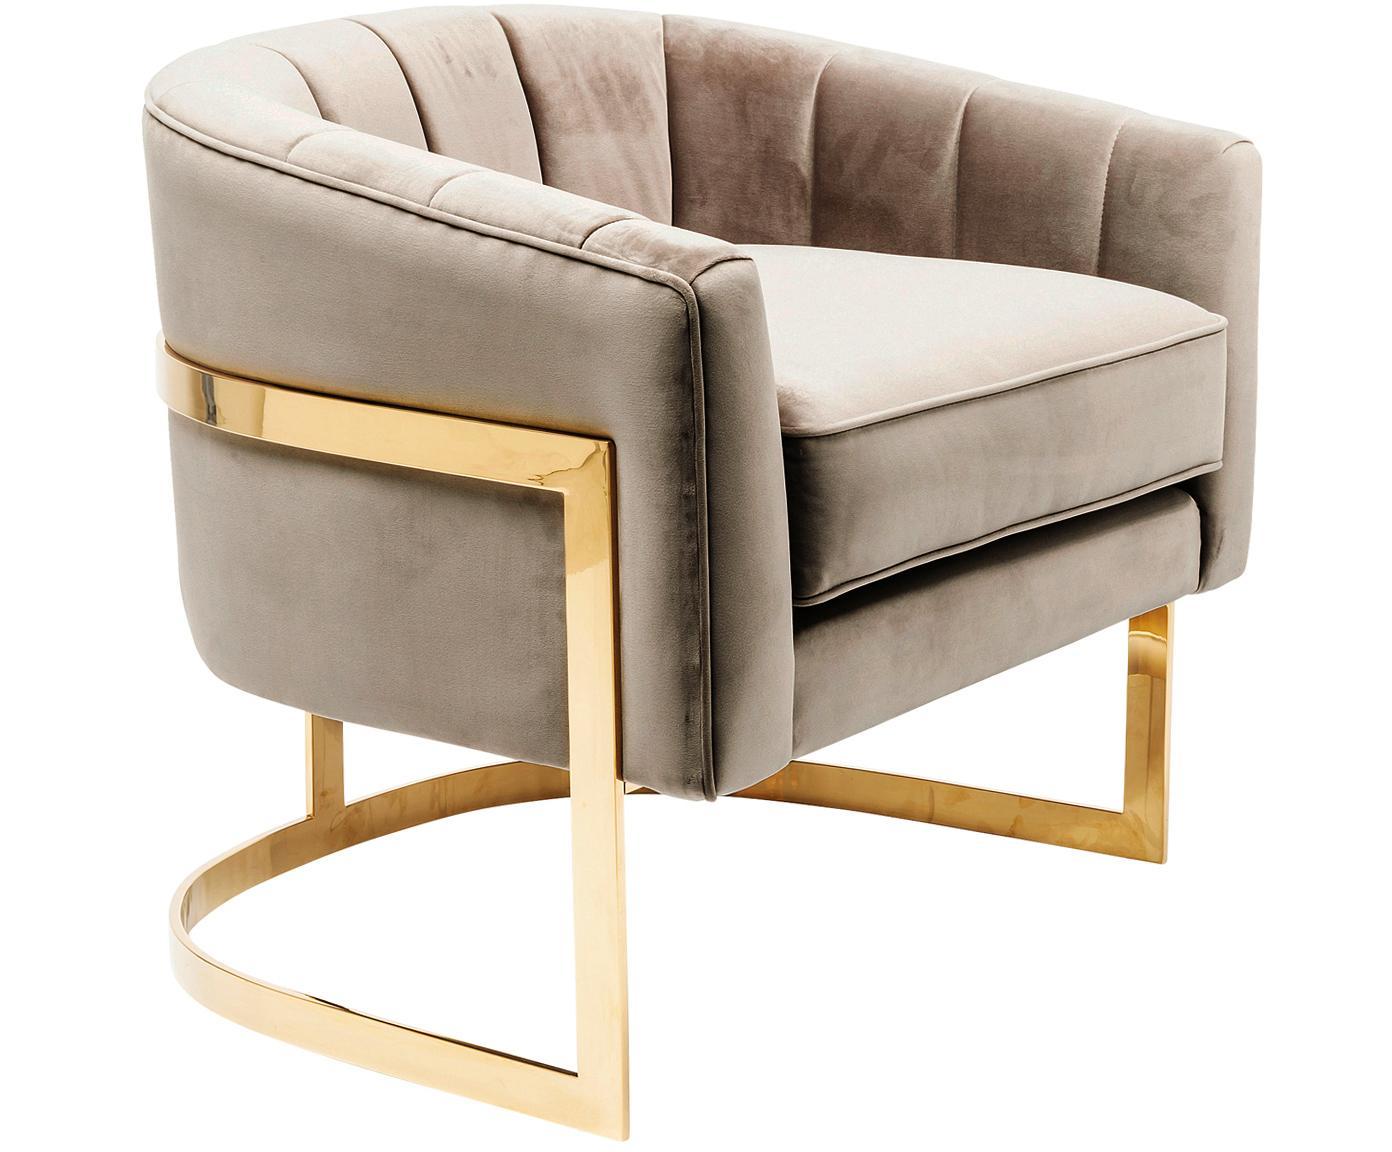 Fluwelen lounge fauteuil Pure Elegance in greige, Bekleding: polyester (fluweel), Frame: verchroomd edelstaal, Frame: massief grenenhout, Greige, B 77 x D 70 cm